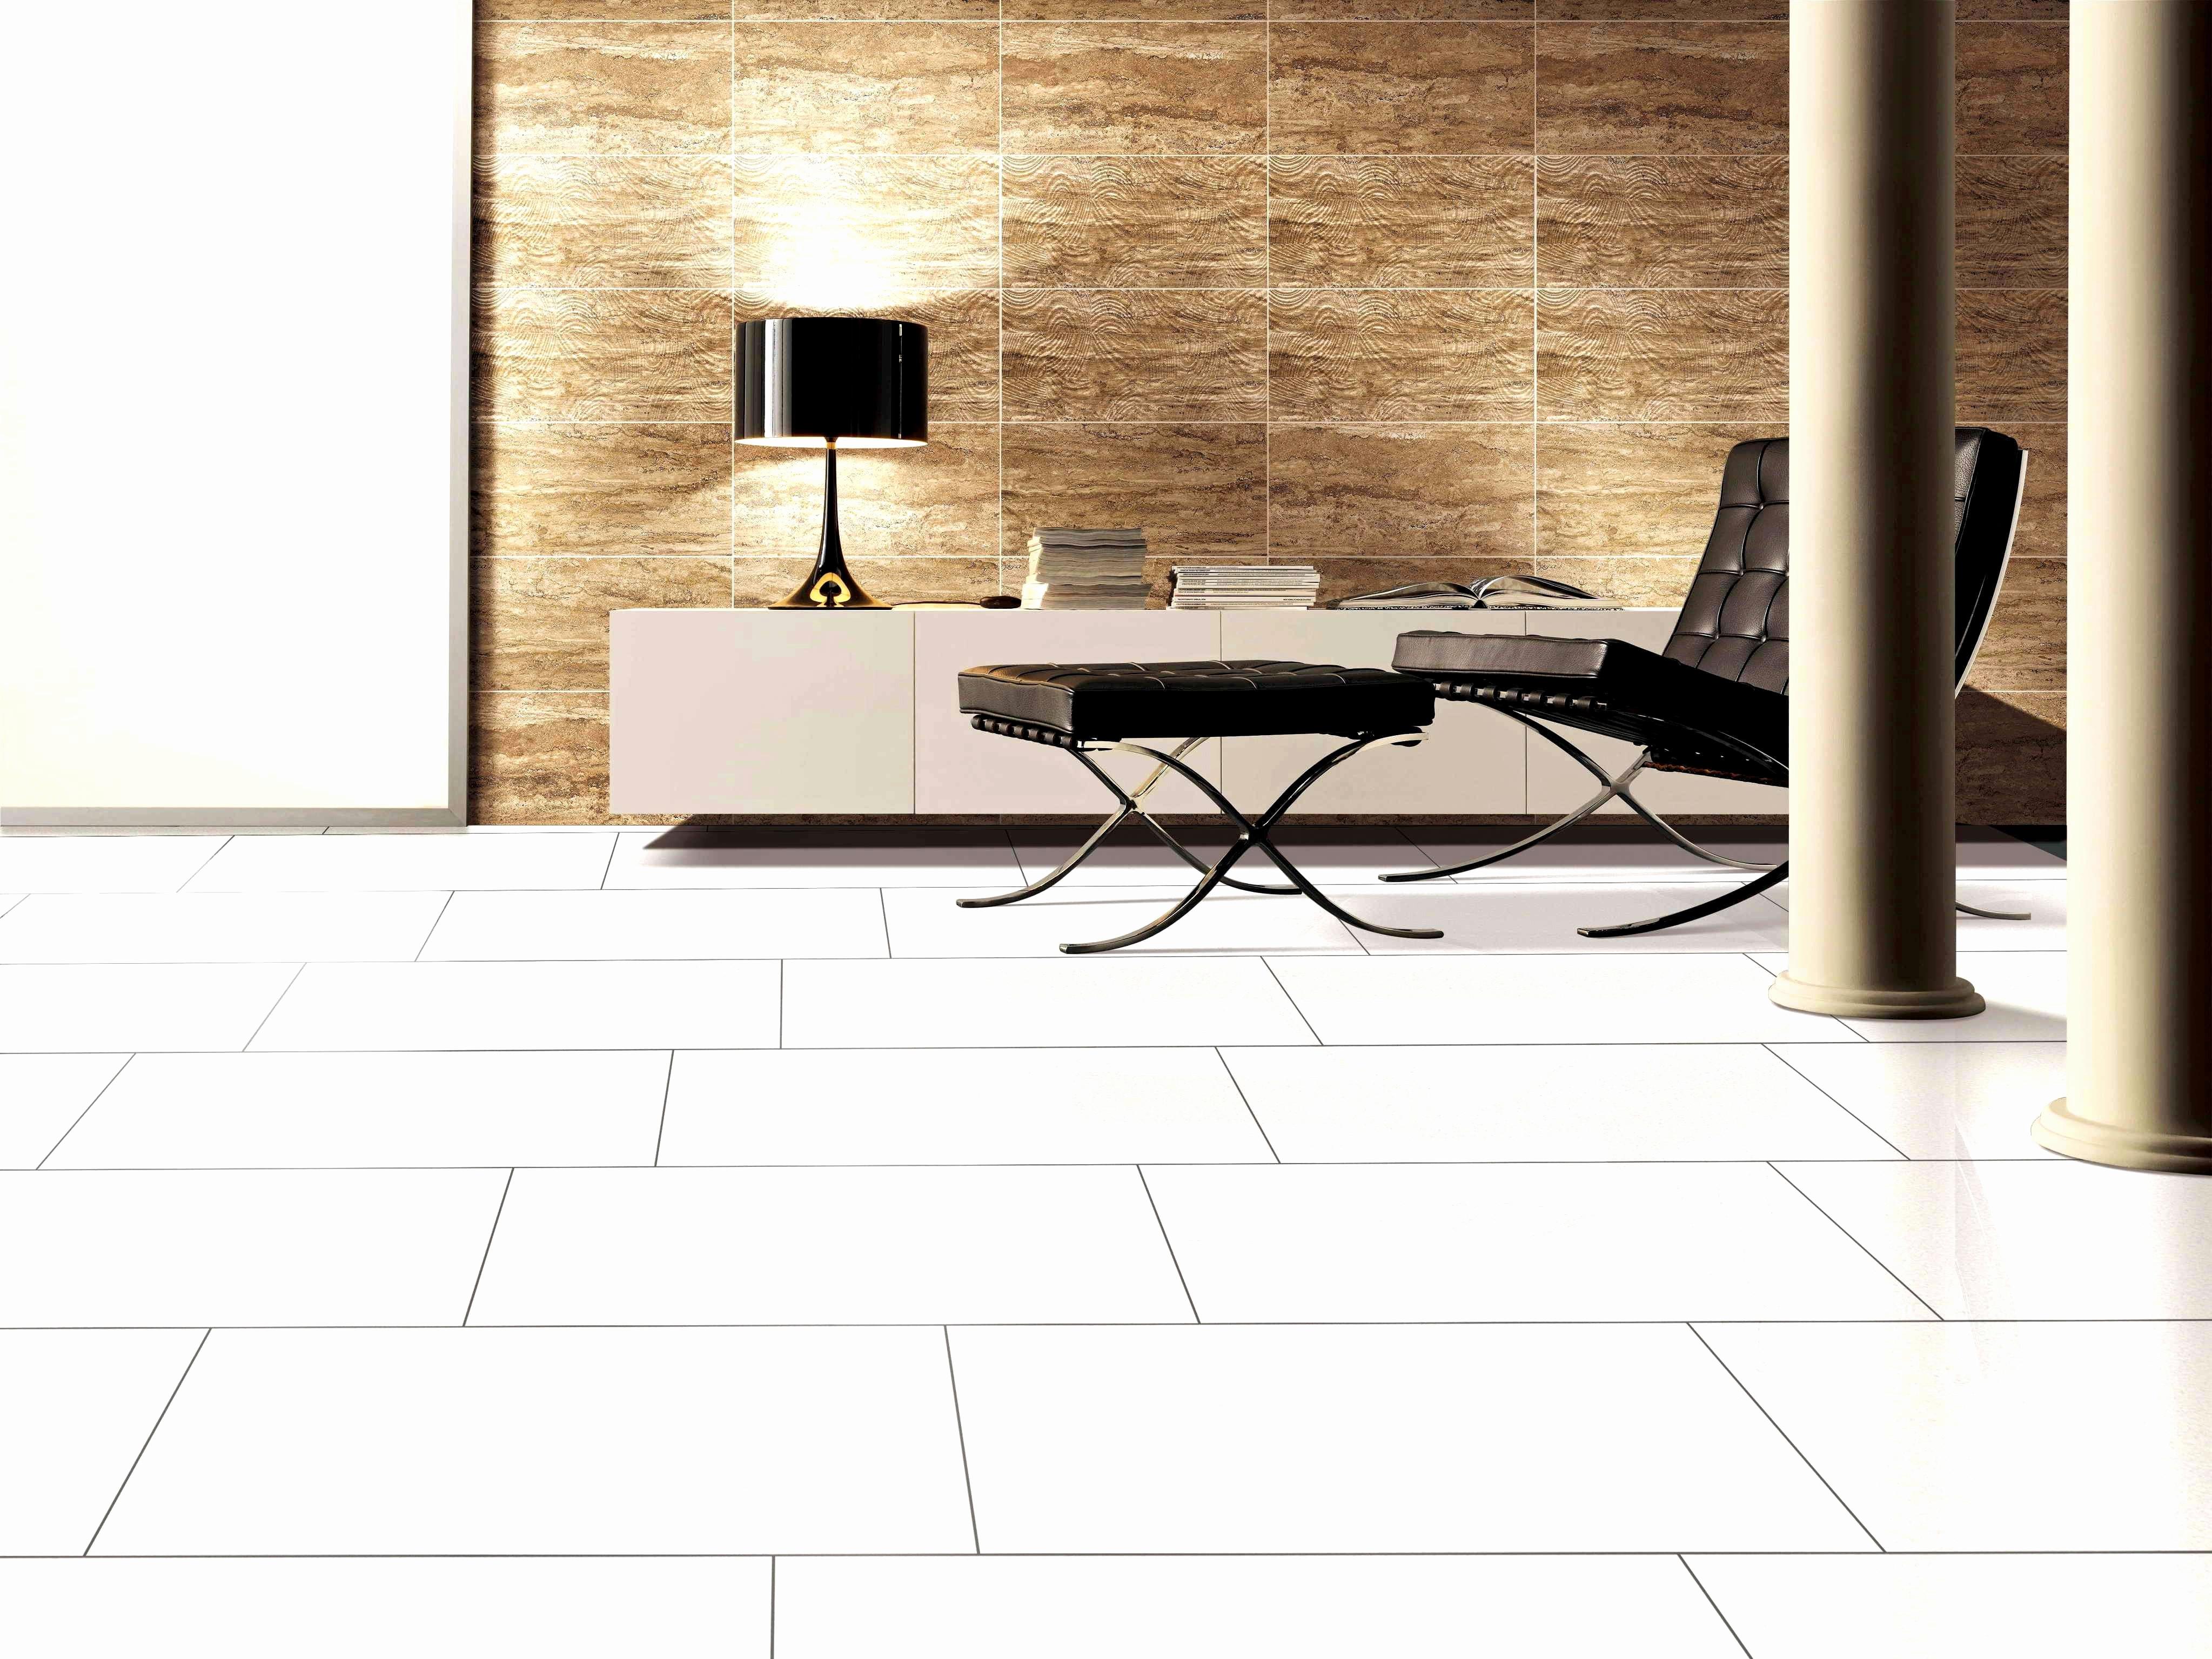 hardwood floor vs tile of amazing wood flooring for bathrooms on kitchen and bath tile luxury throughout amazing wood flooring for bathrooms on kitchen and bath tile luxury new tile floor mosaic bathroom 0d new